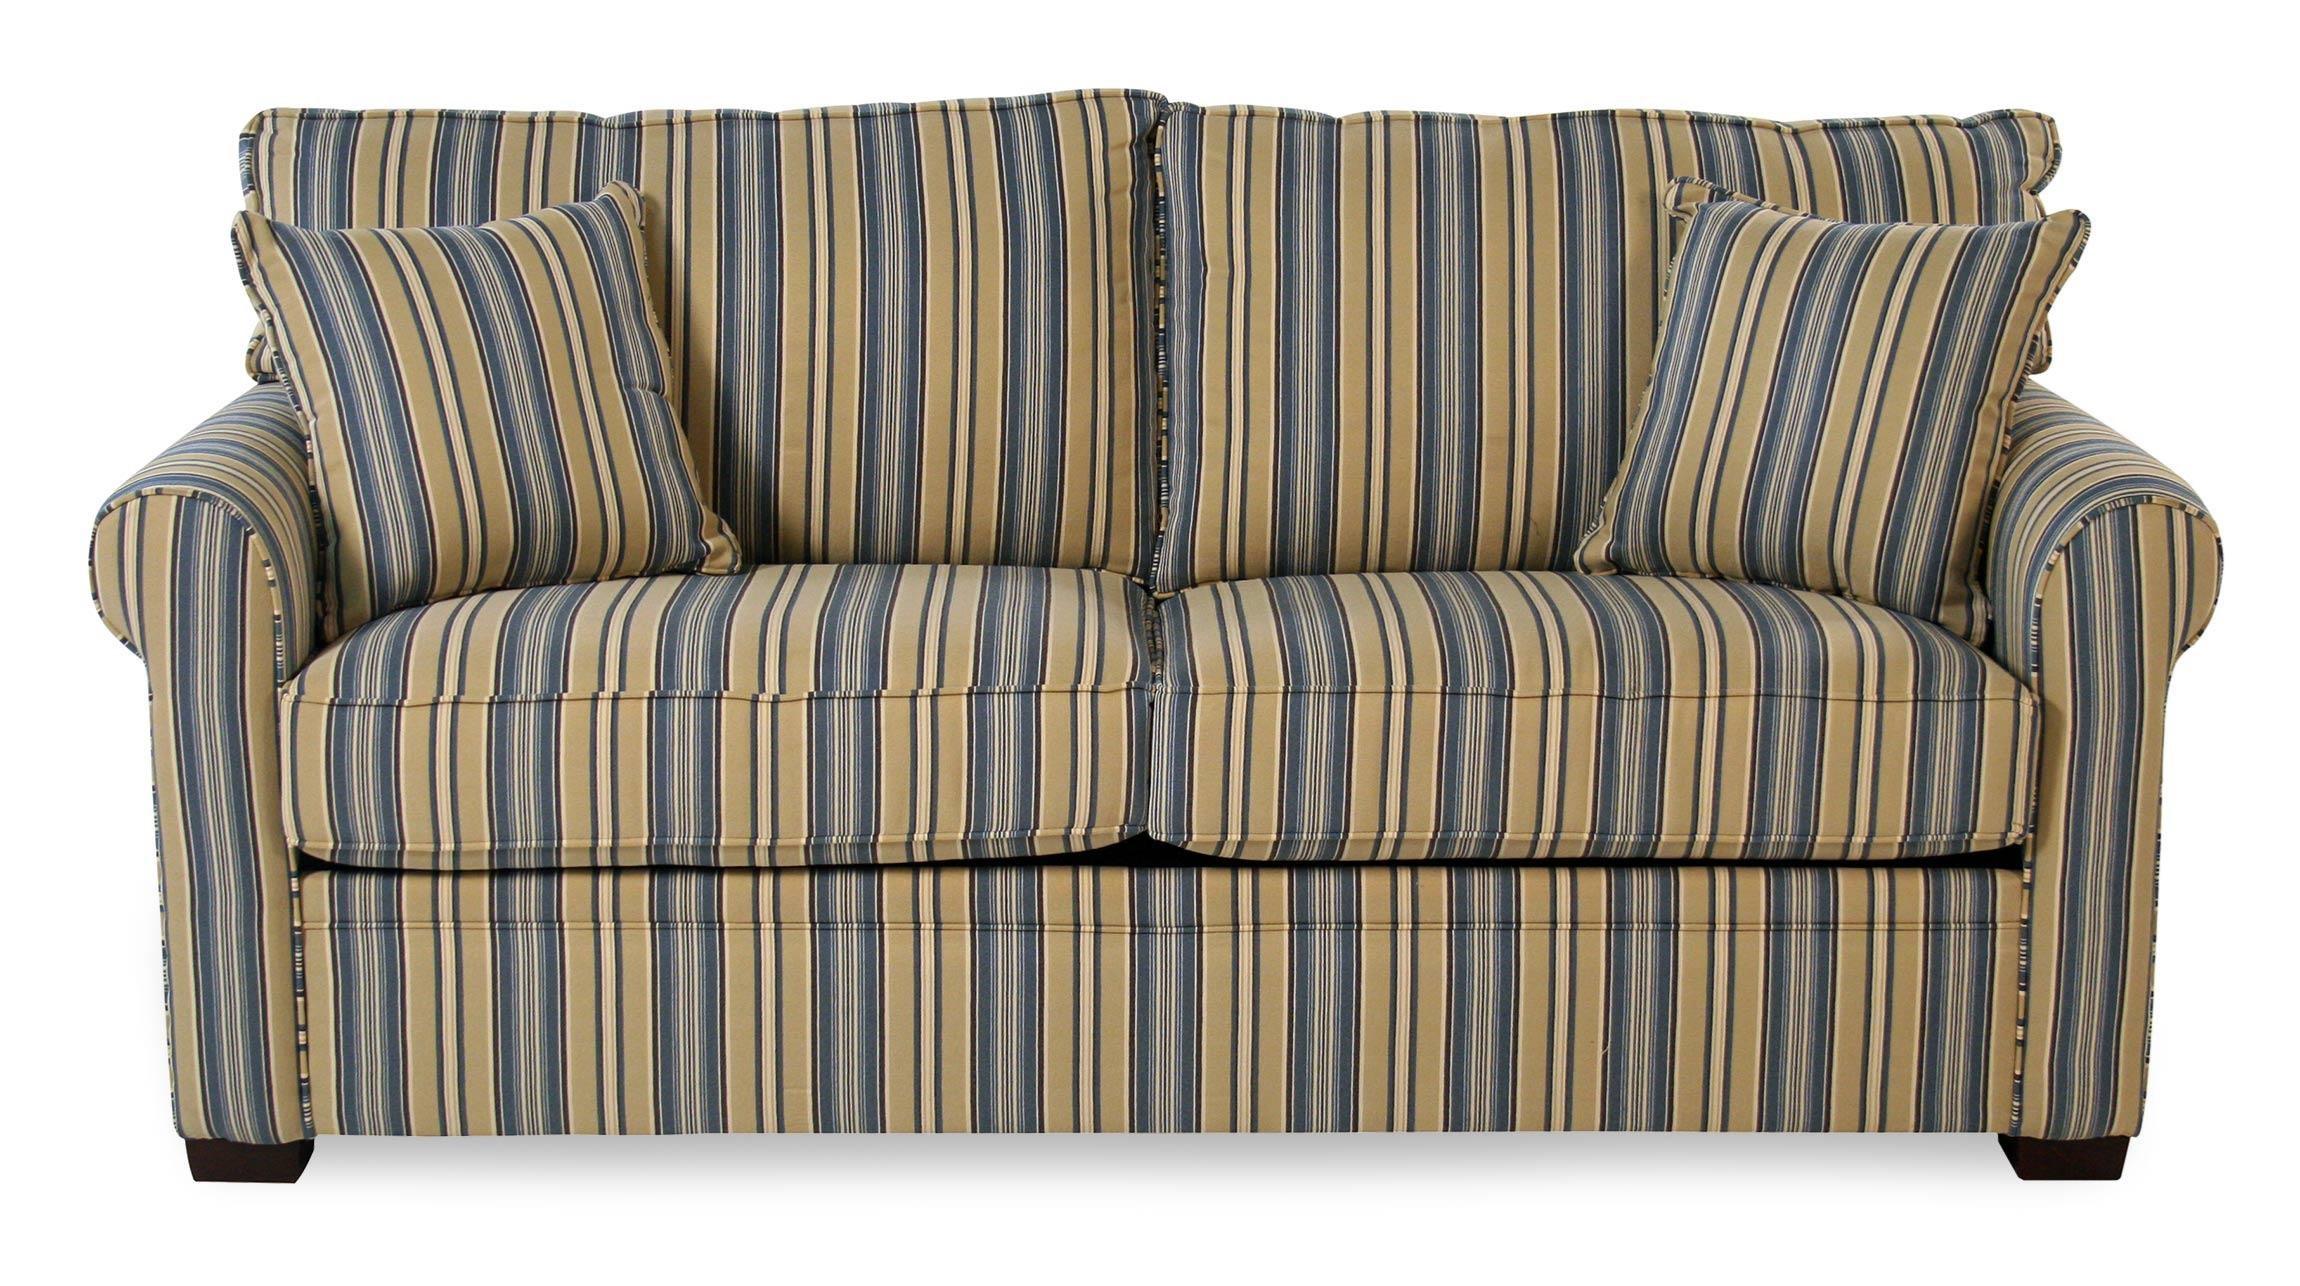 Madison Manor ManorSleep Queen Sleeper Sofa - Item Number: 2950-QS